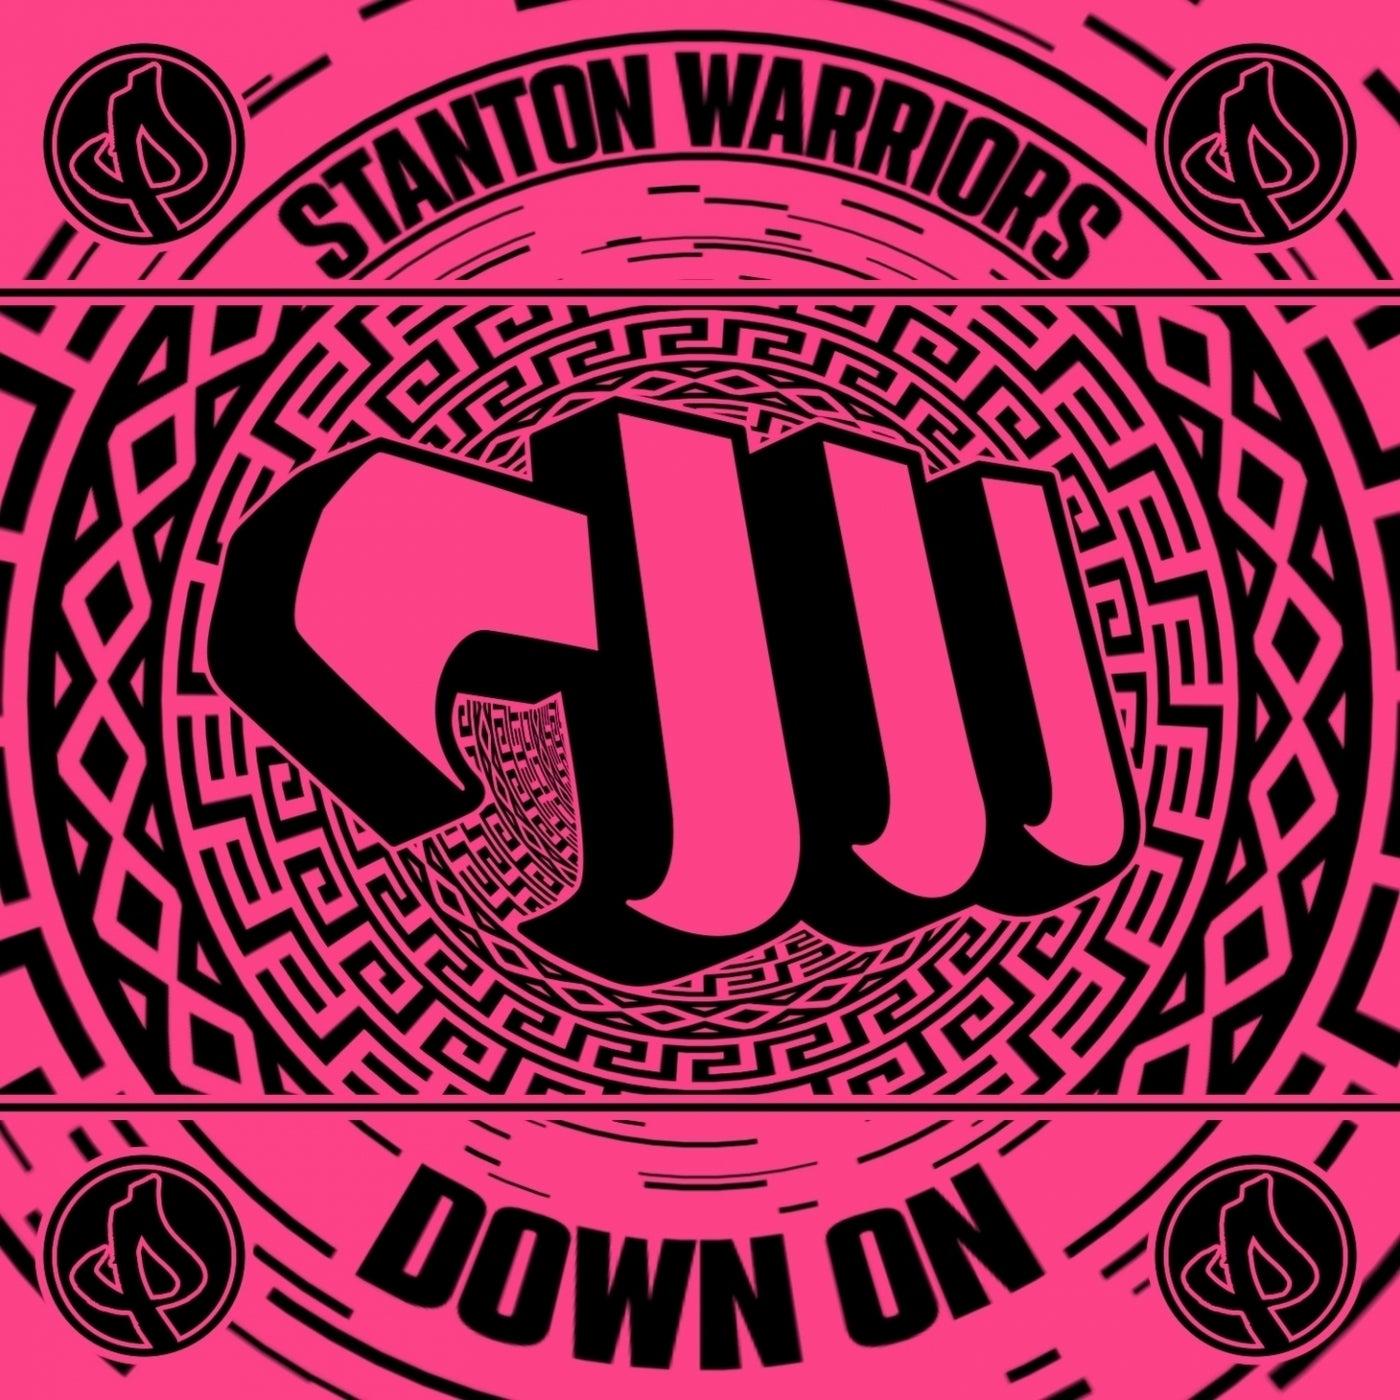 Down On (Original Mix)